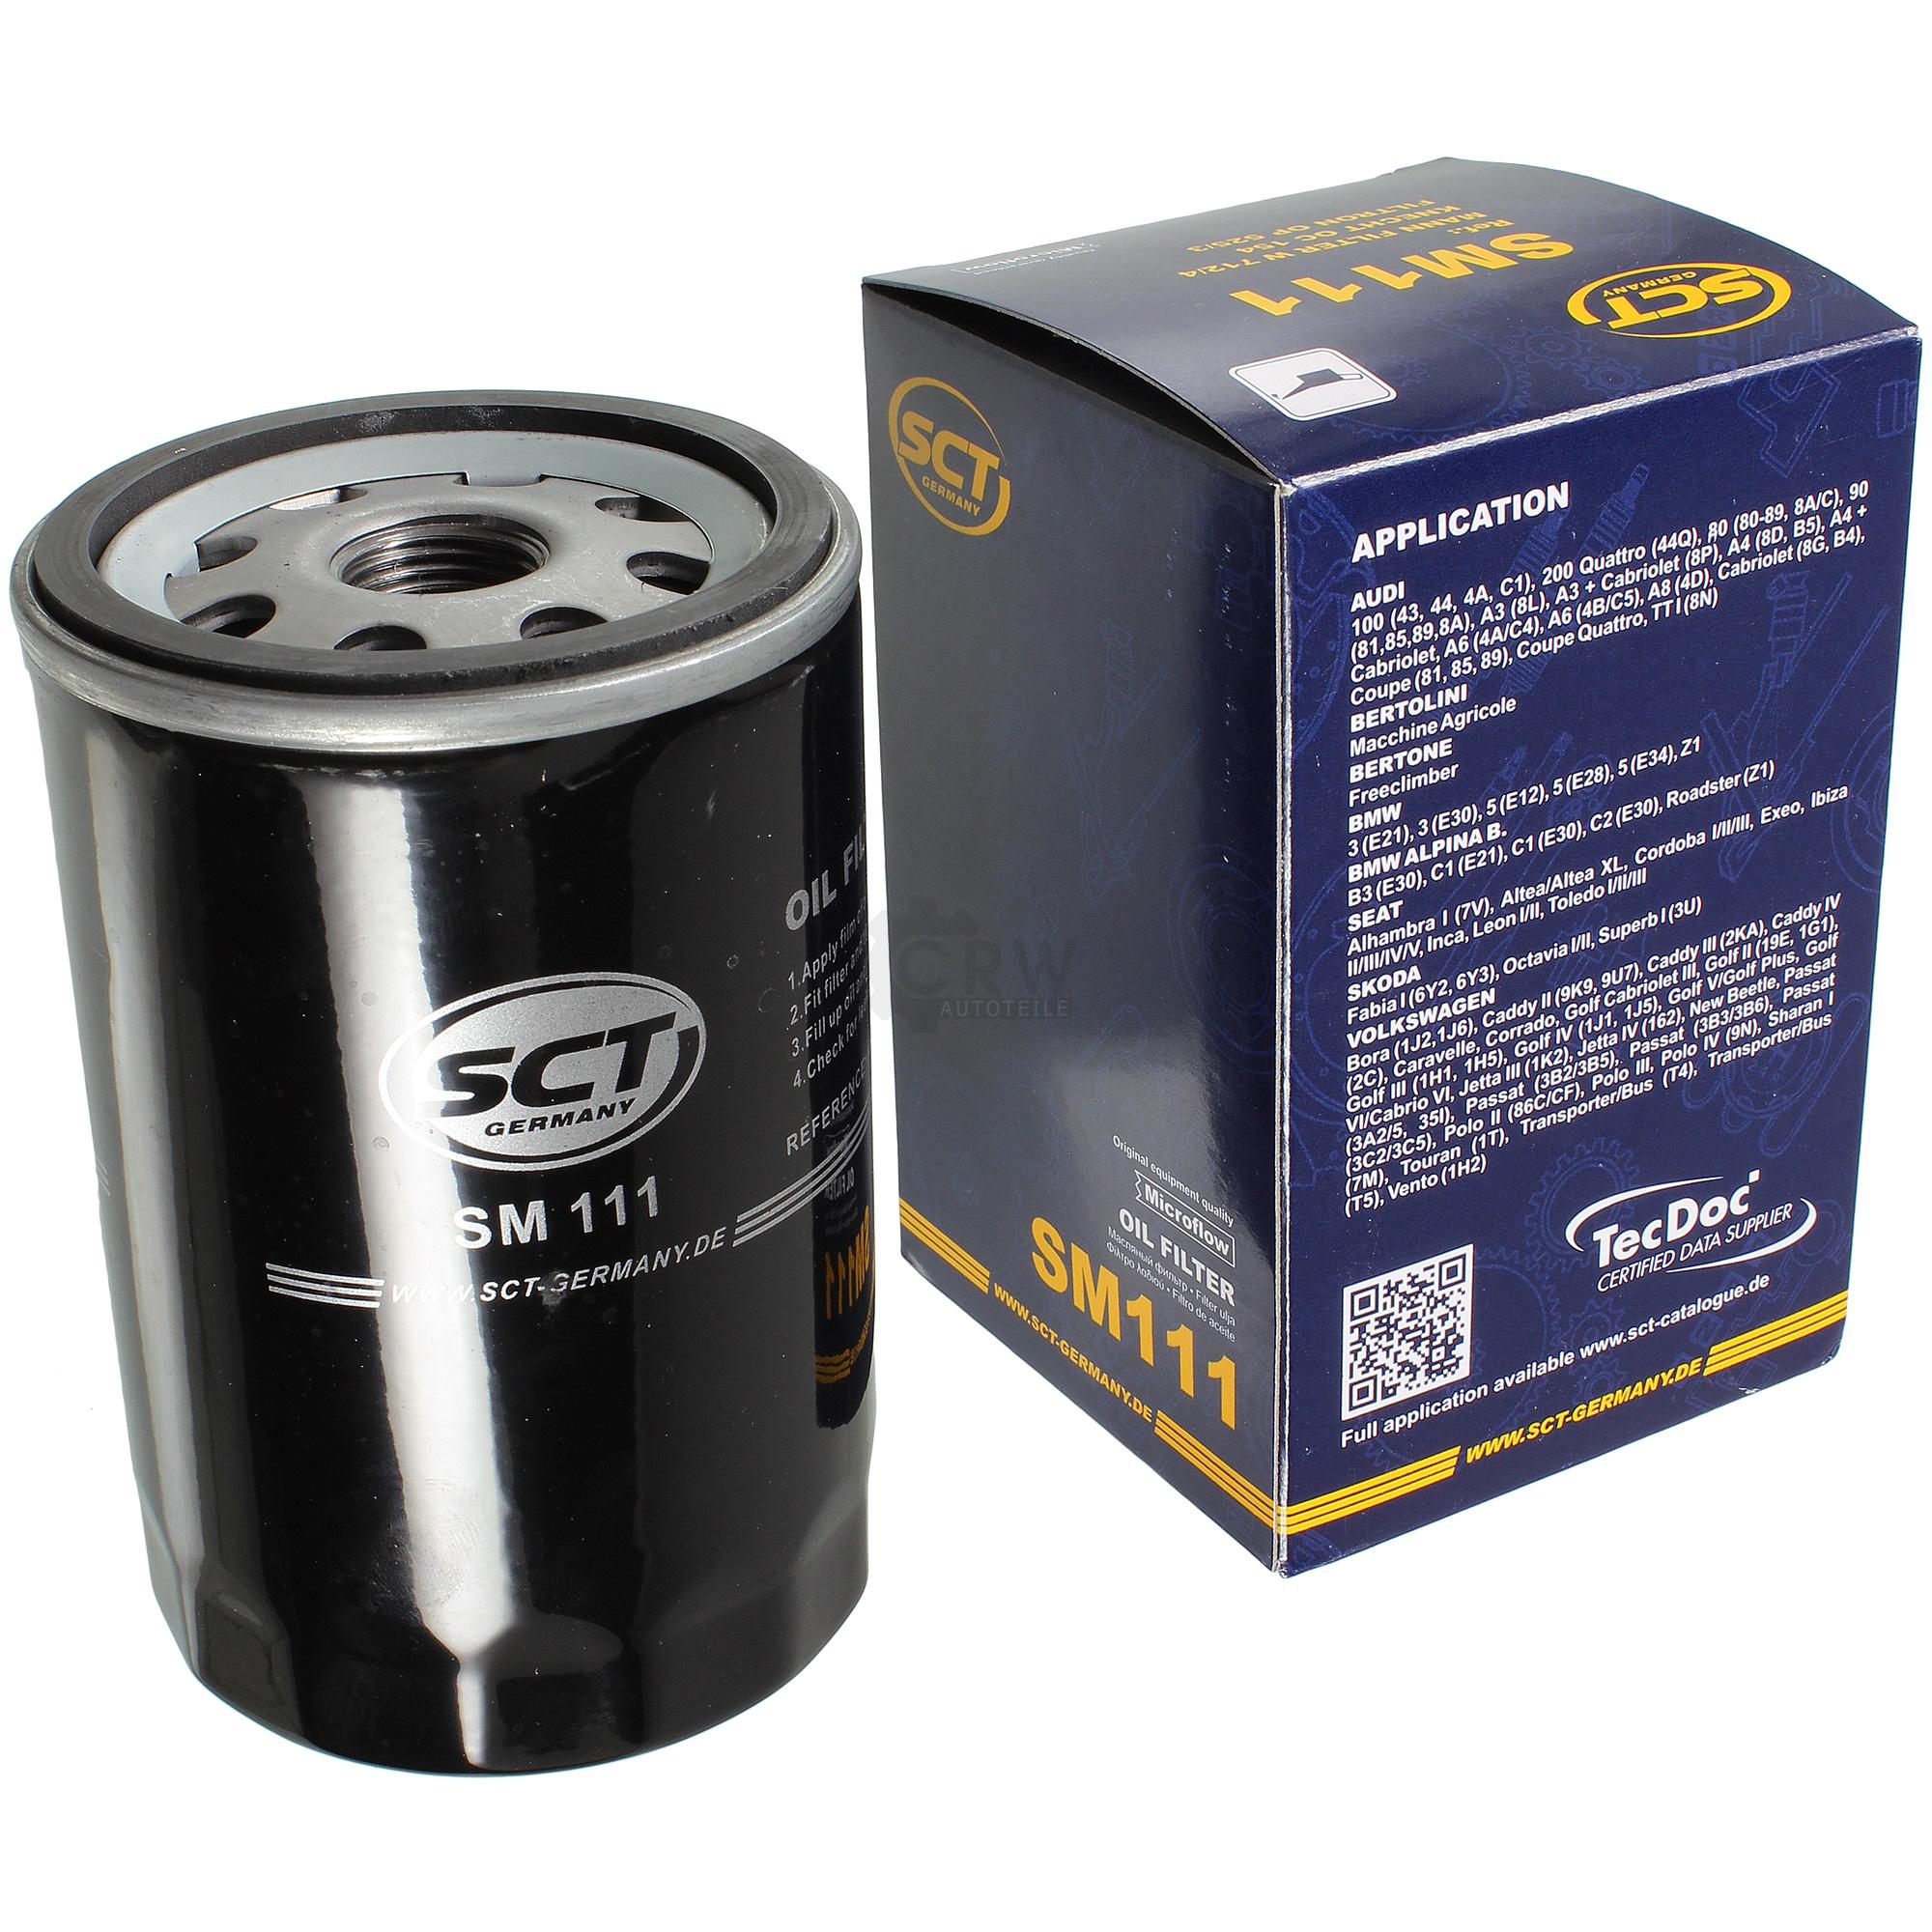 Olwechsel-Set-6L-MANNOL-Extreme-5W-40-Motoroel-SCT-Filter-KIT-10190815 Indexbild 2